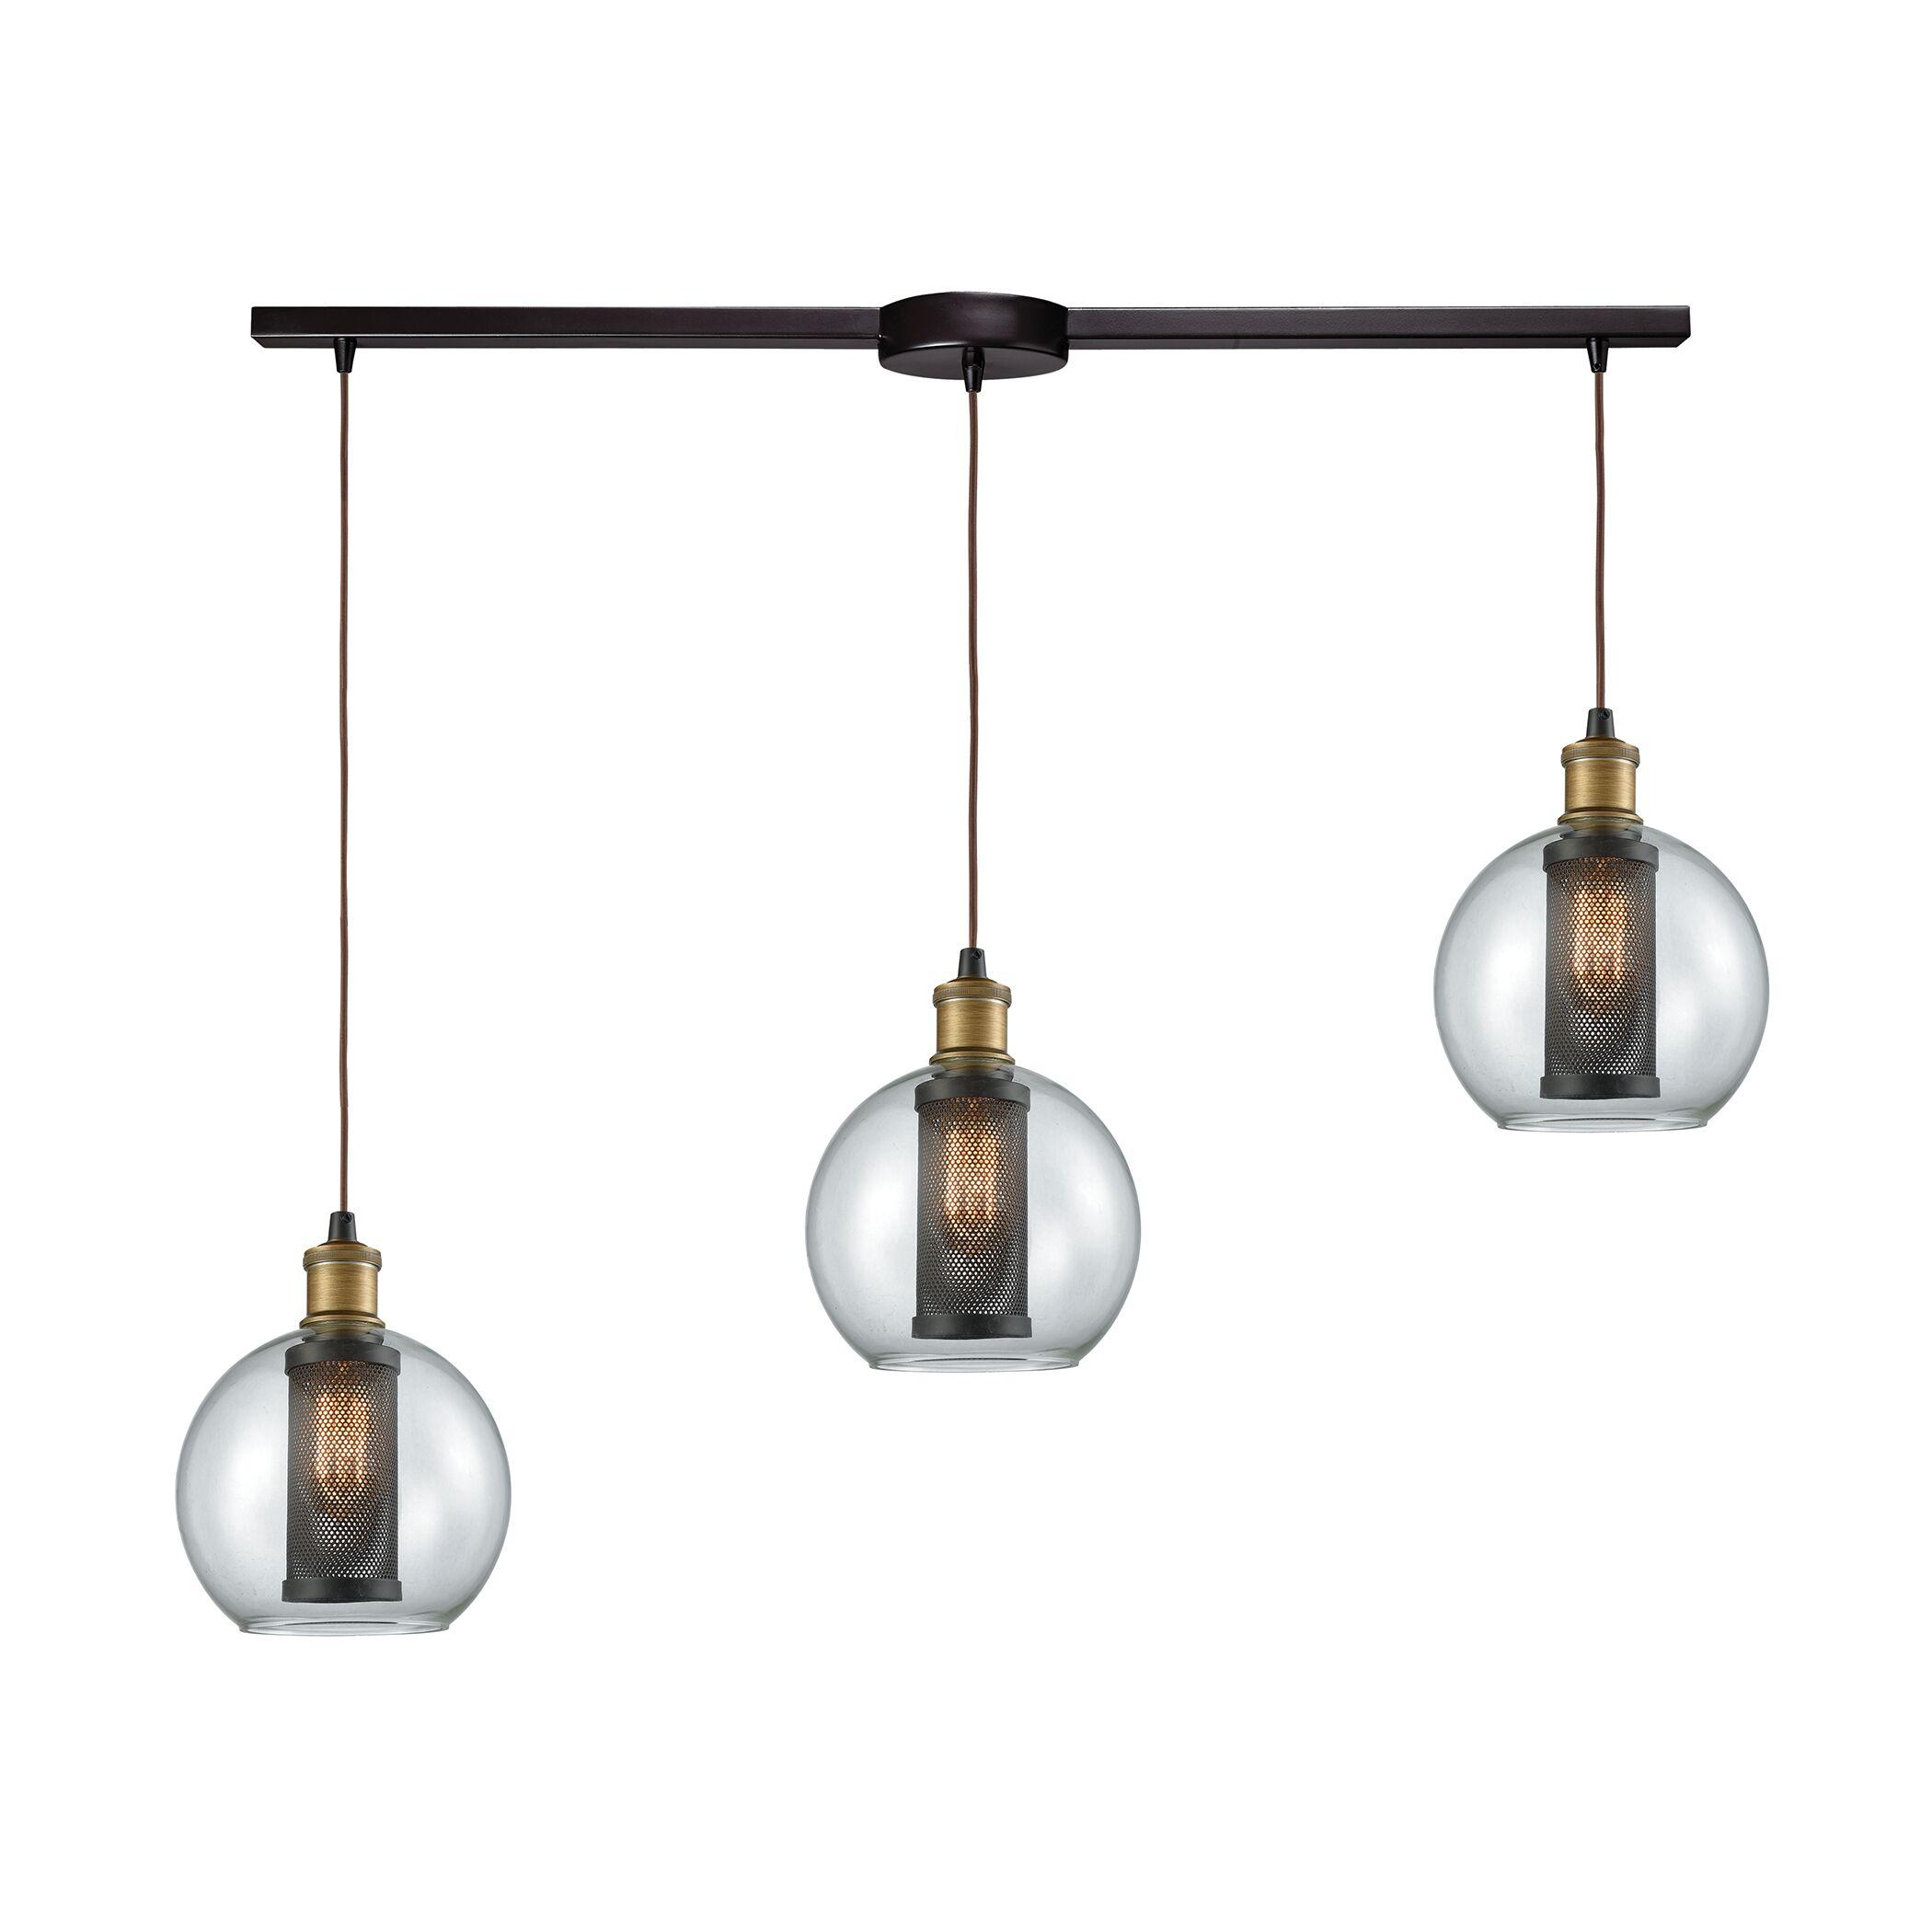 McEwan Industrial 3-Light Cluster Pendant